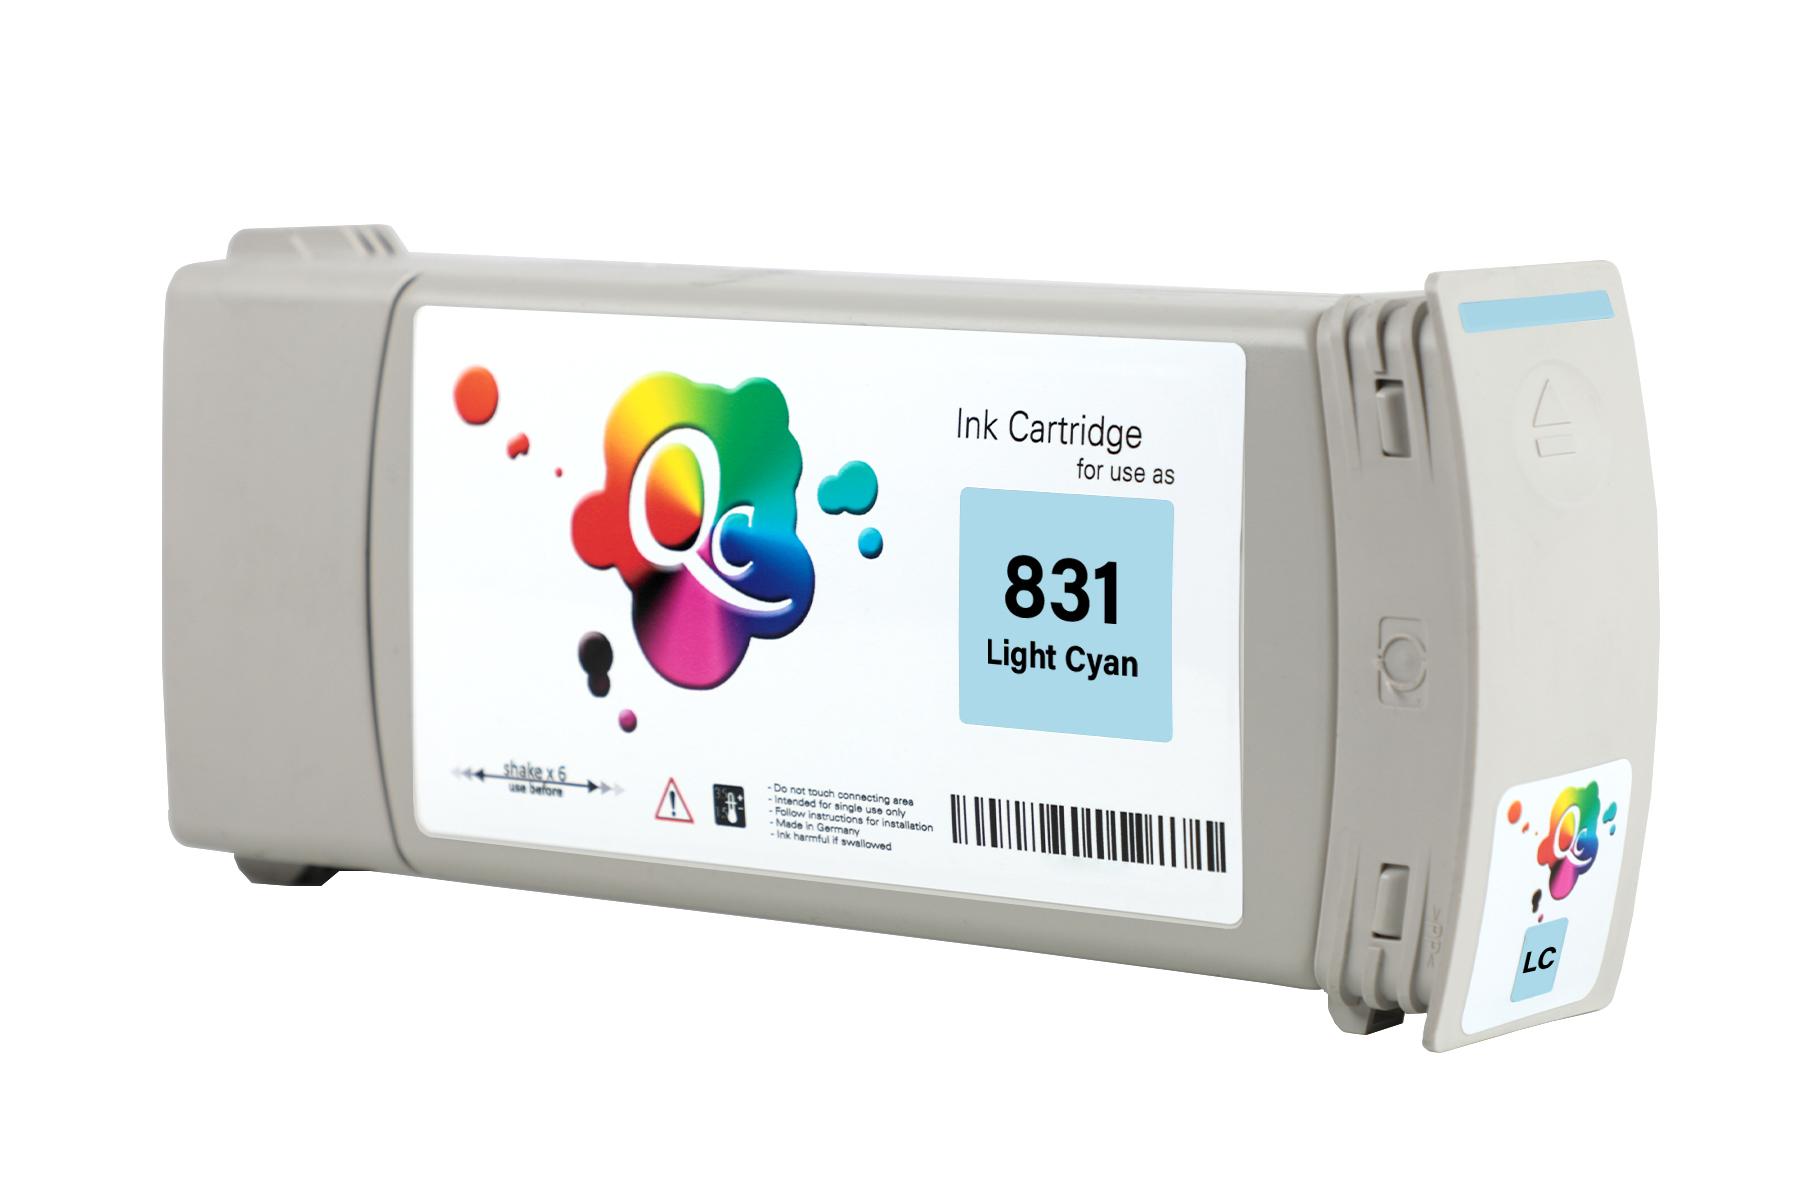 HP 831 CZ698A Light Cyan Açık Mavi Lateks Muadil Mürekkep Kartuş 775ml